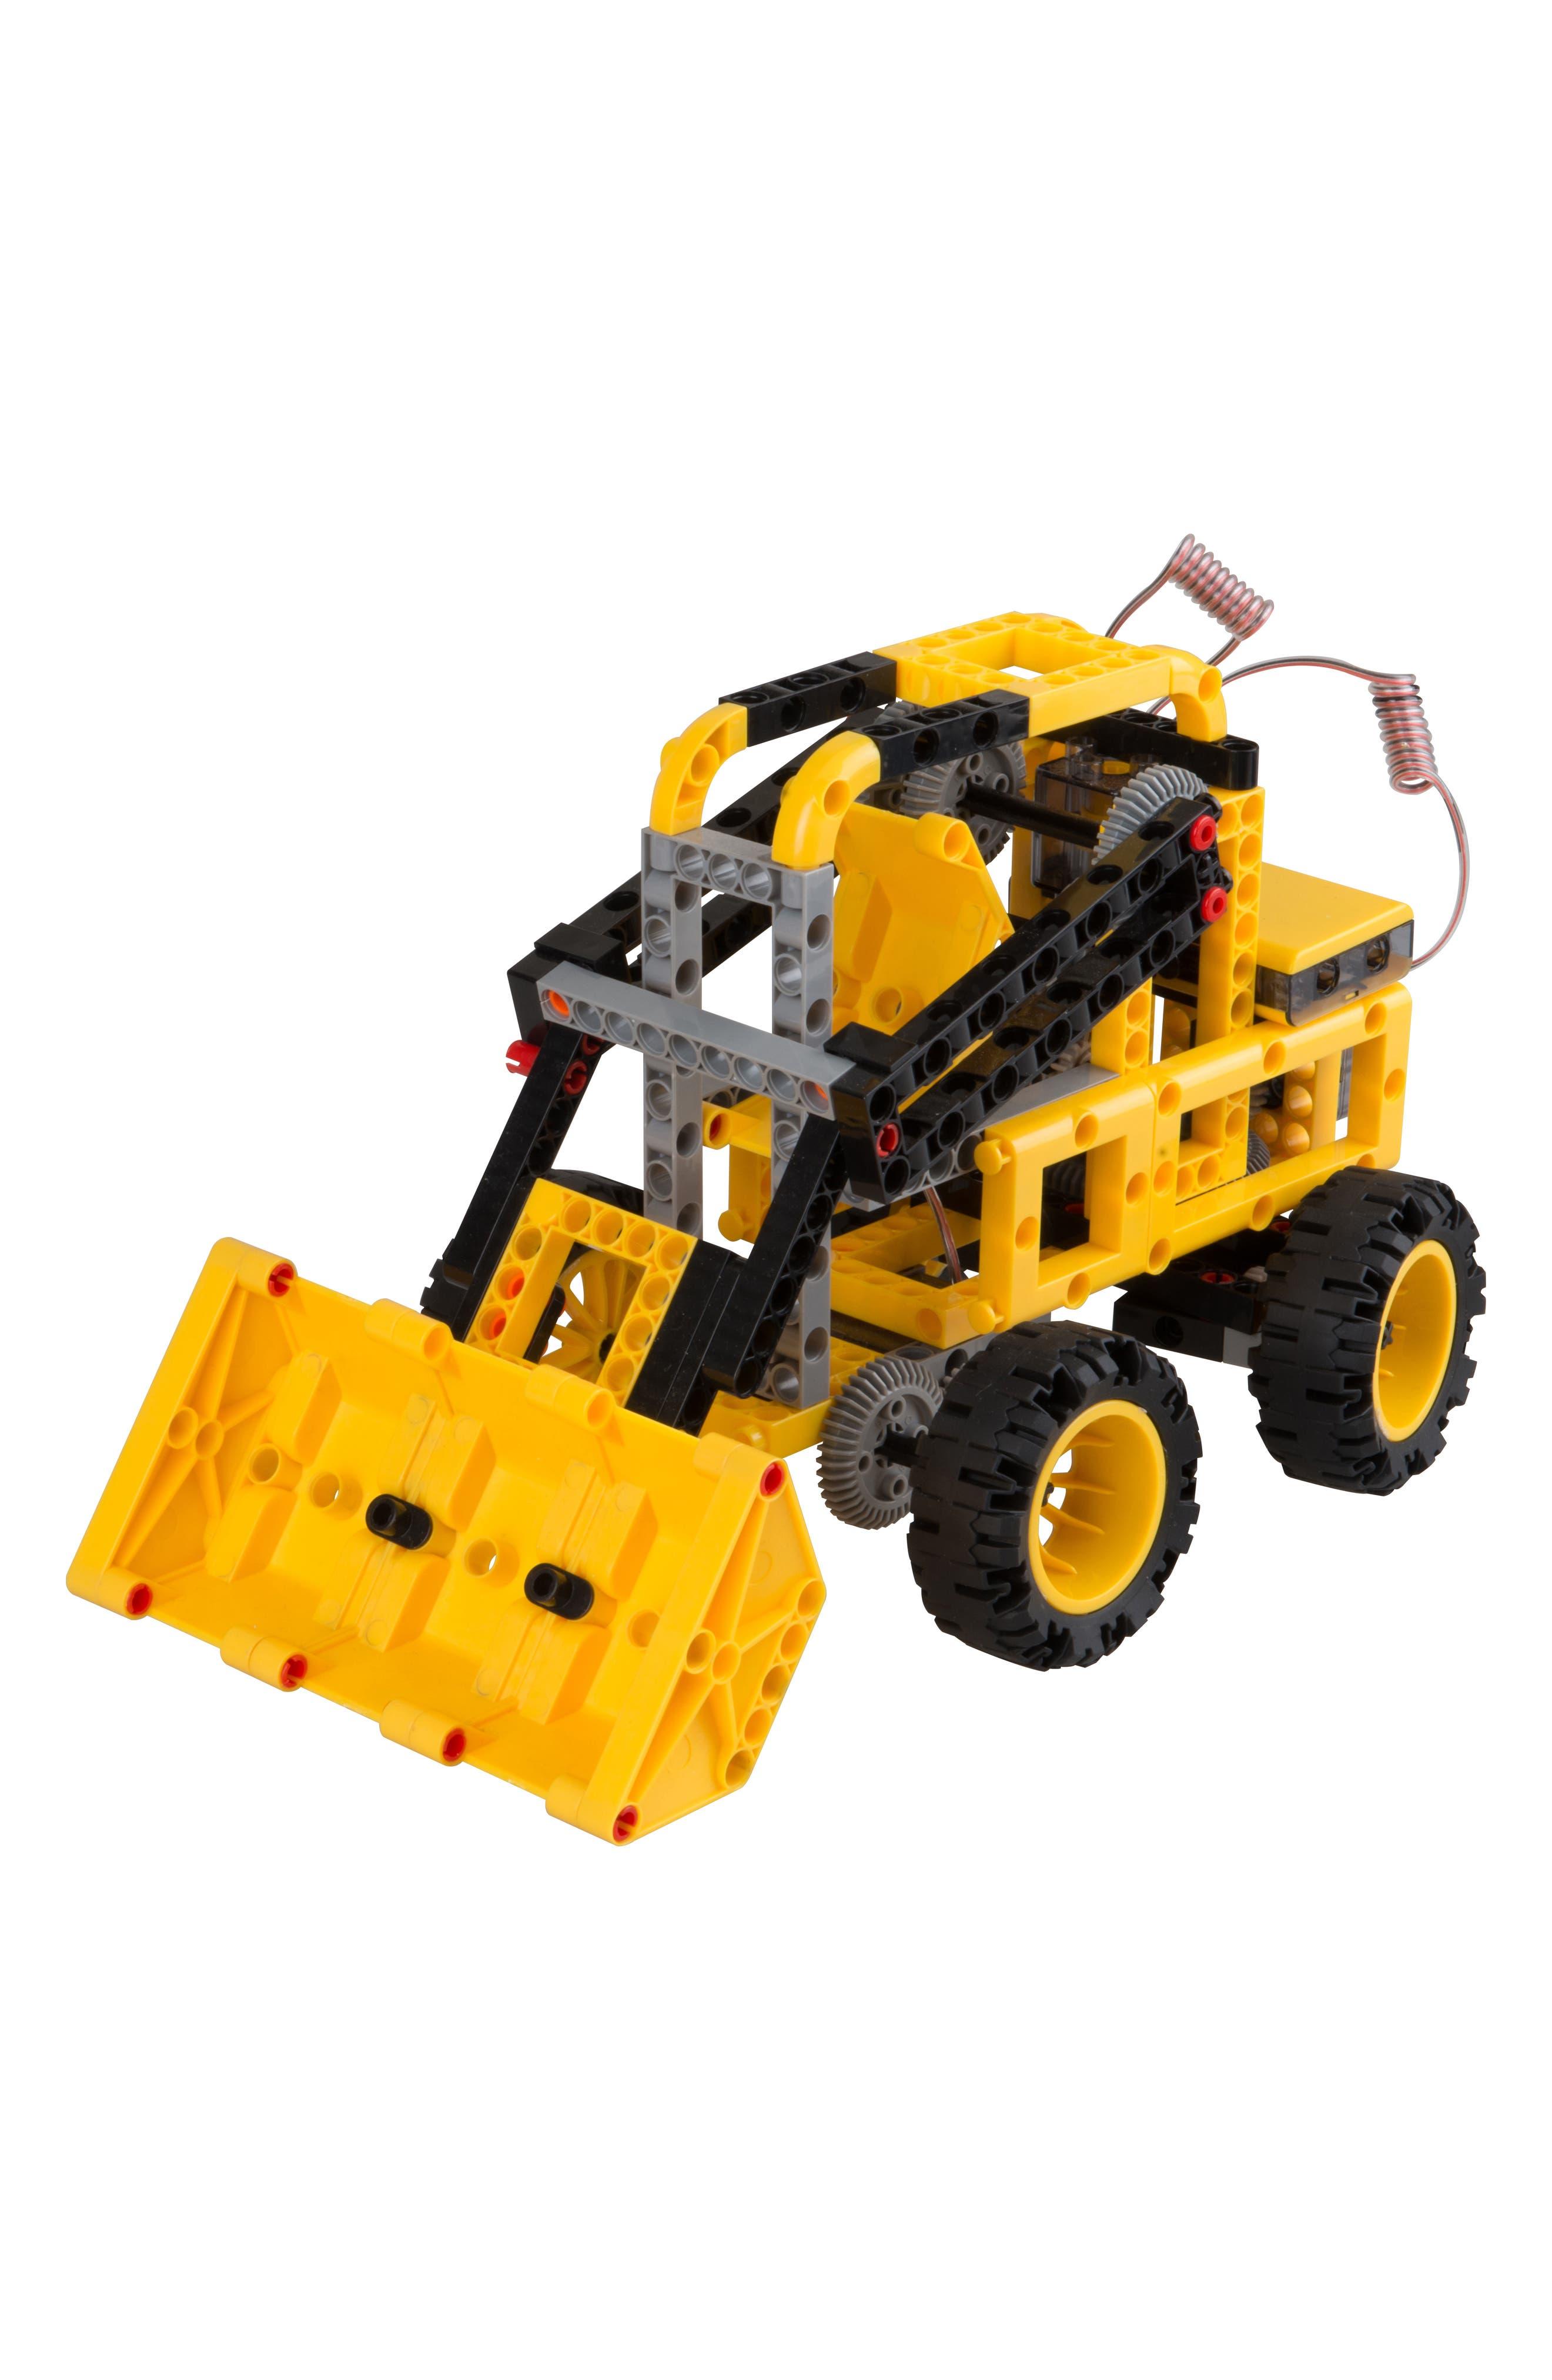 Remote Control Machines Construction Vehicles Kit,                             Alternate thumbnail 4, color,                             MULTI